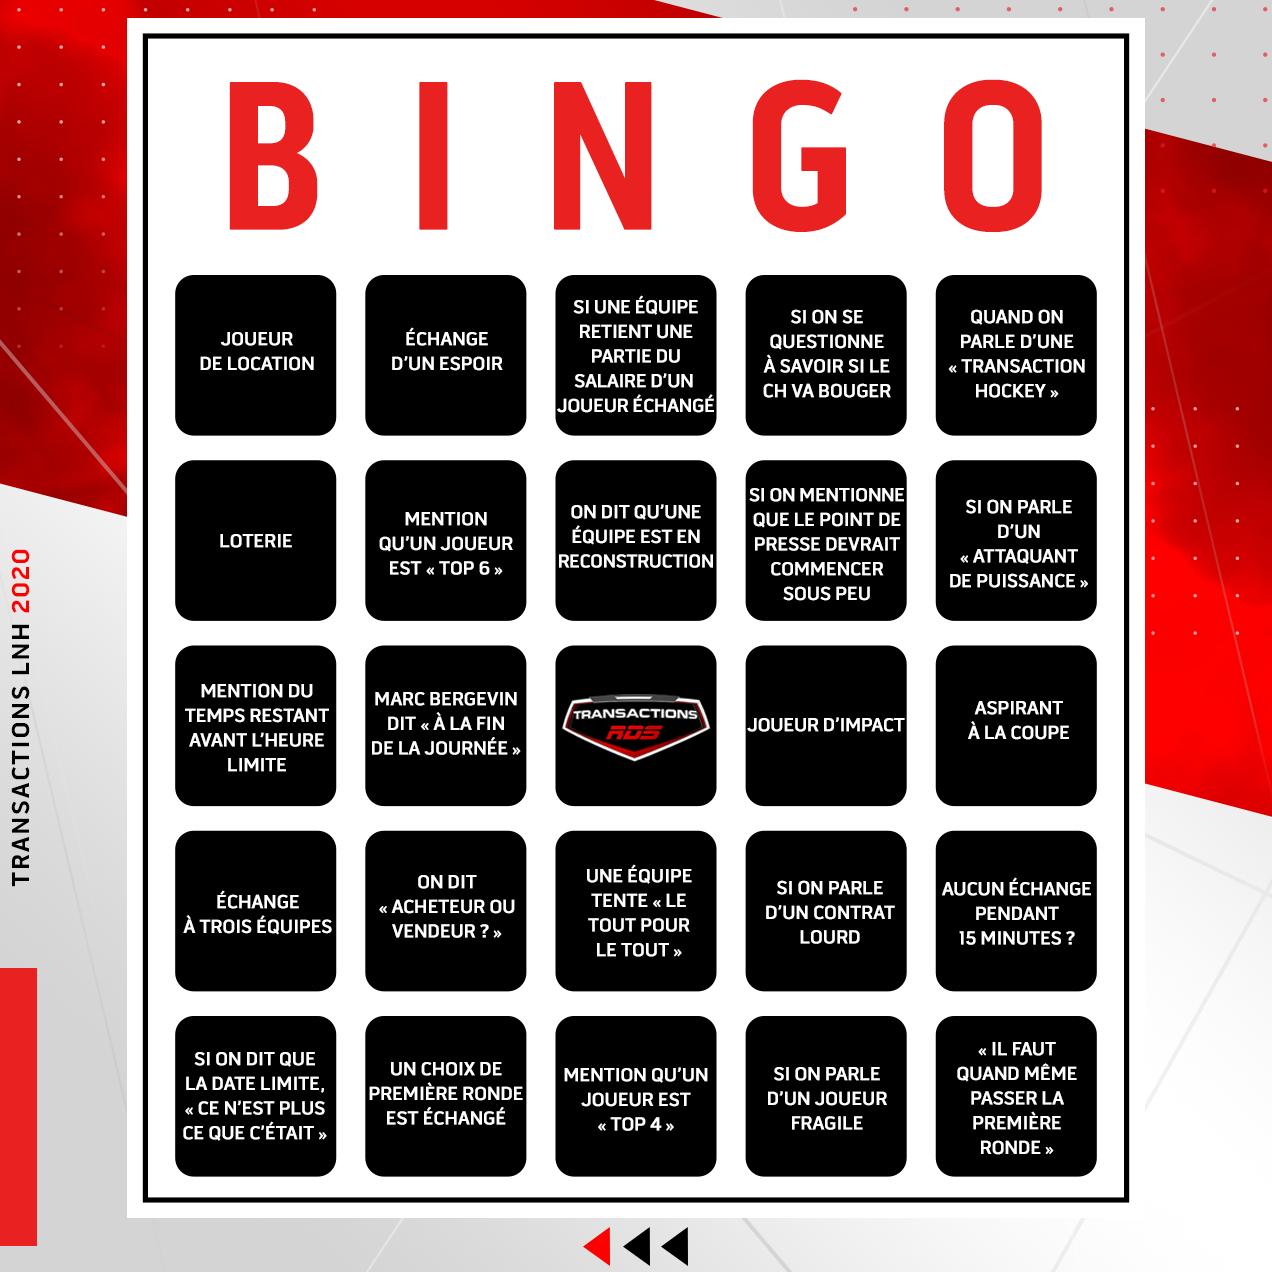 Bingo Transactions LNH